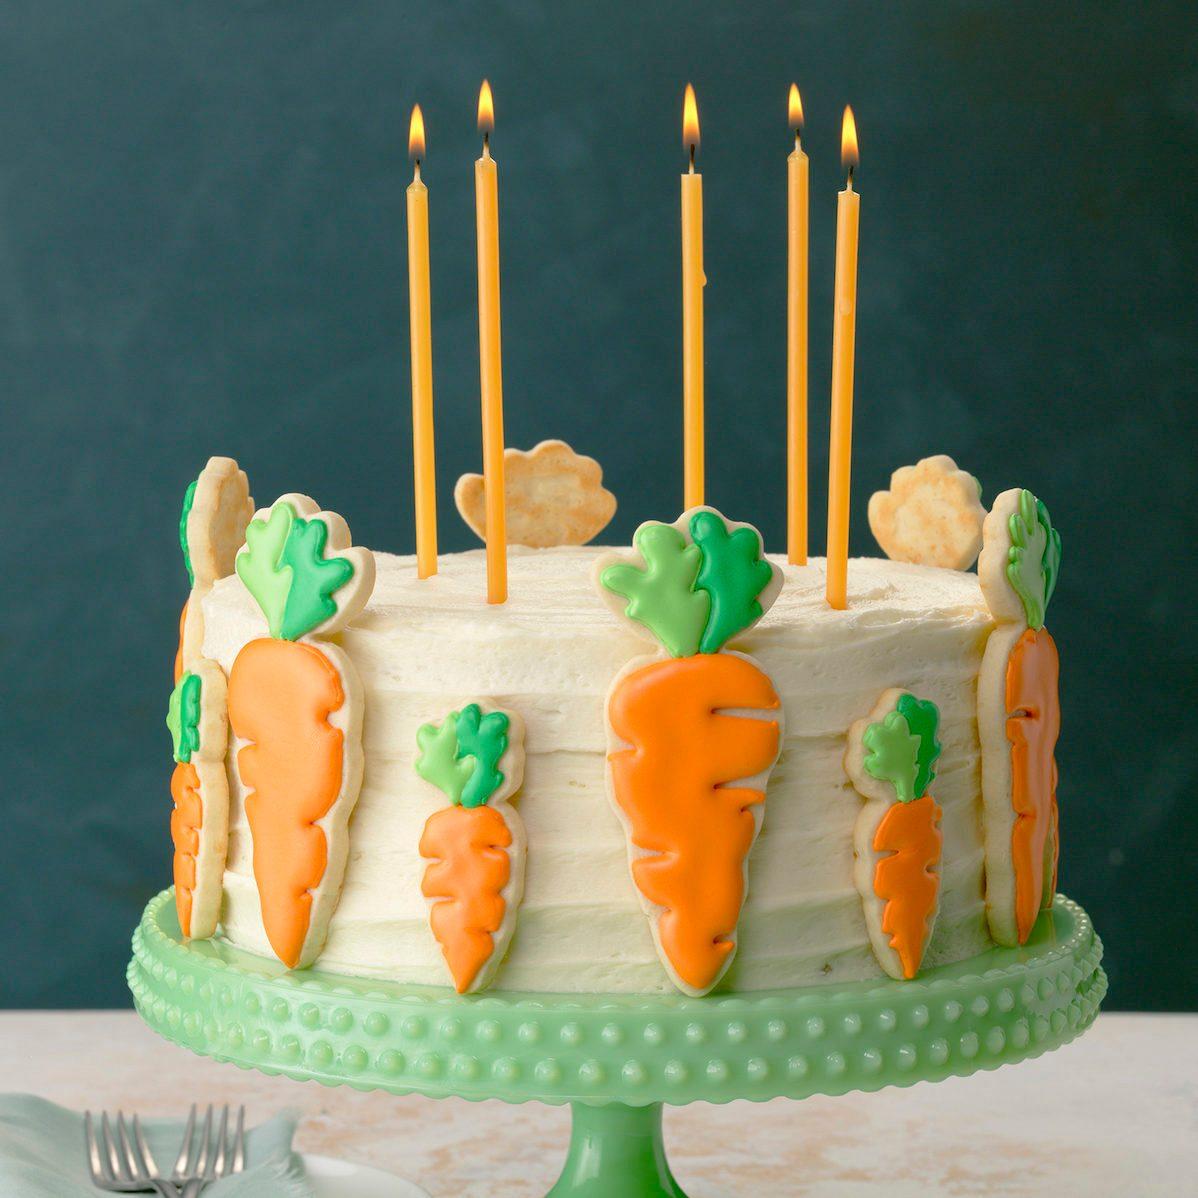 green pedistal; aqua linen; green wall; forks; light painted surface; candles